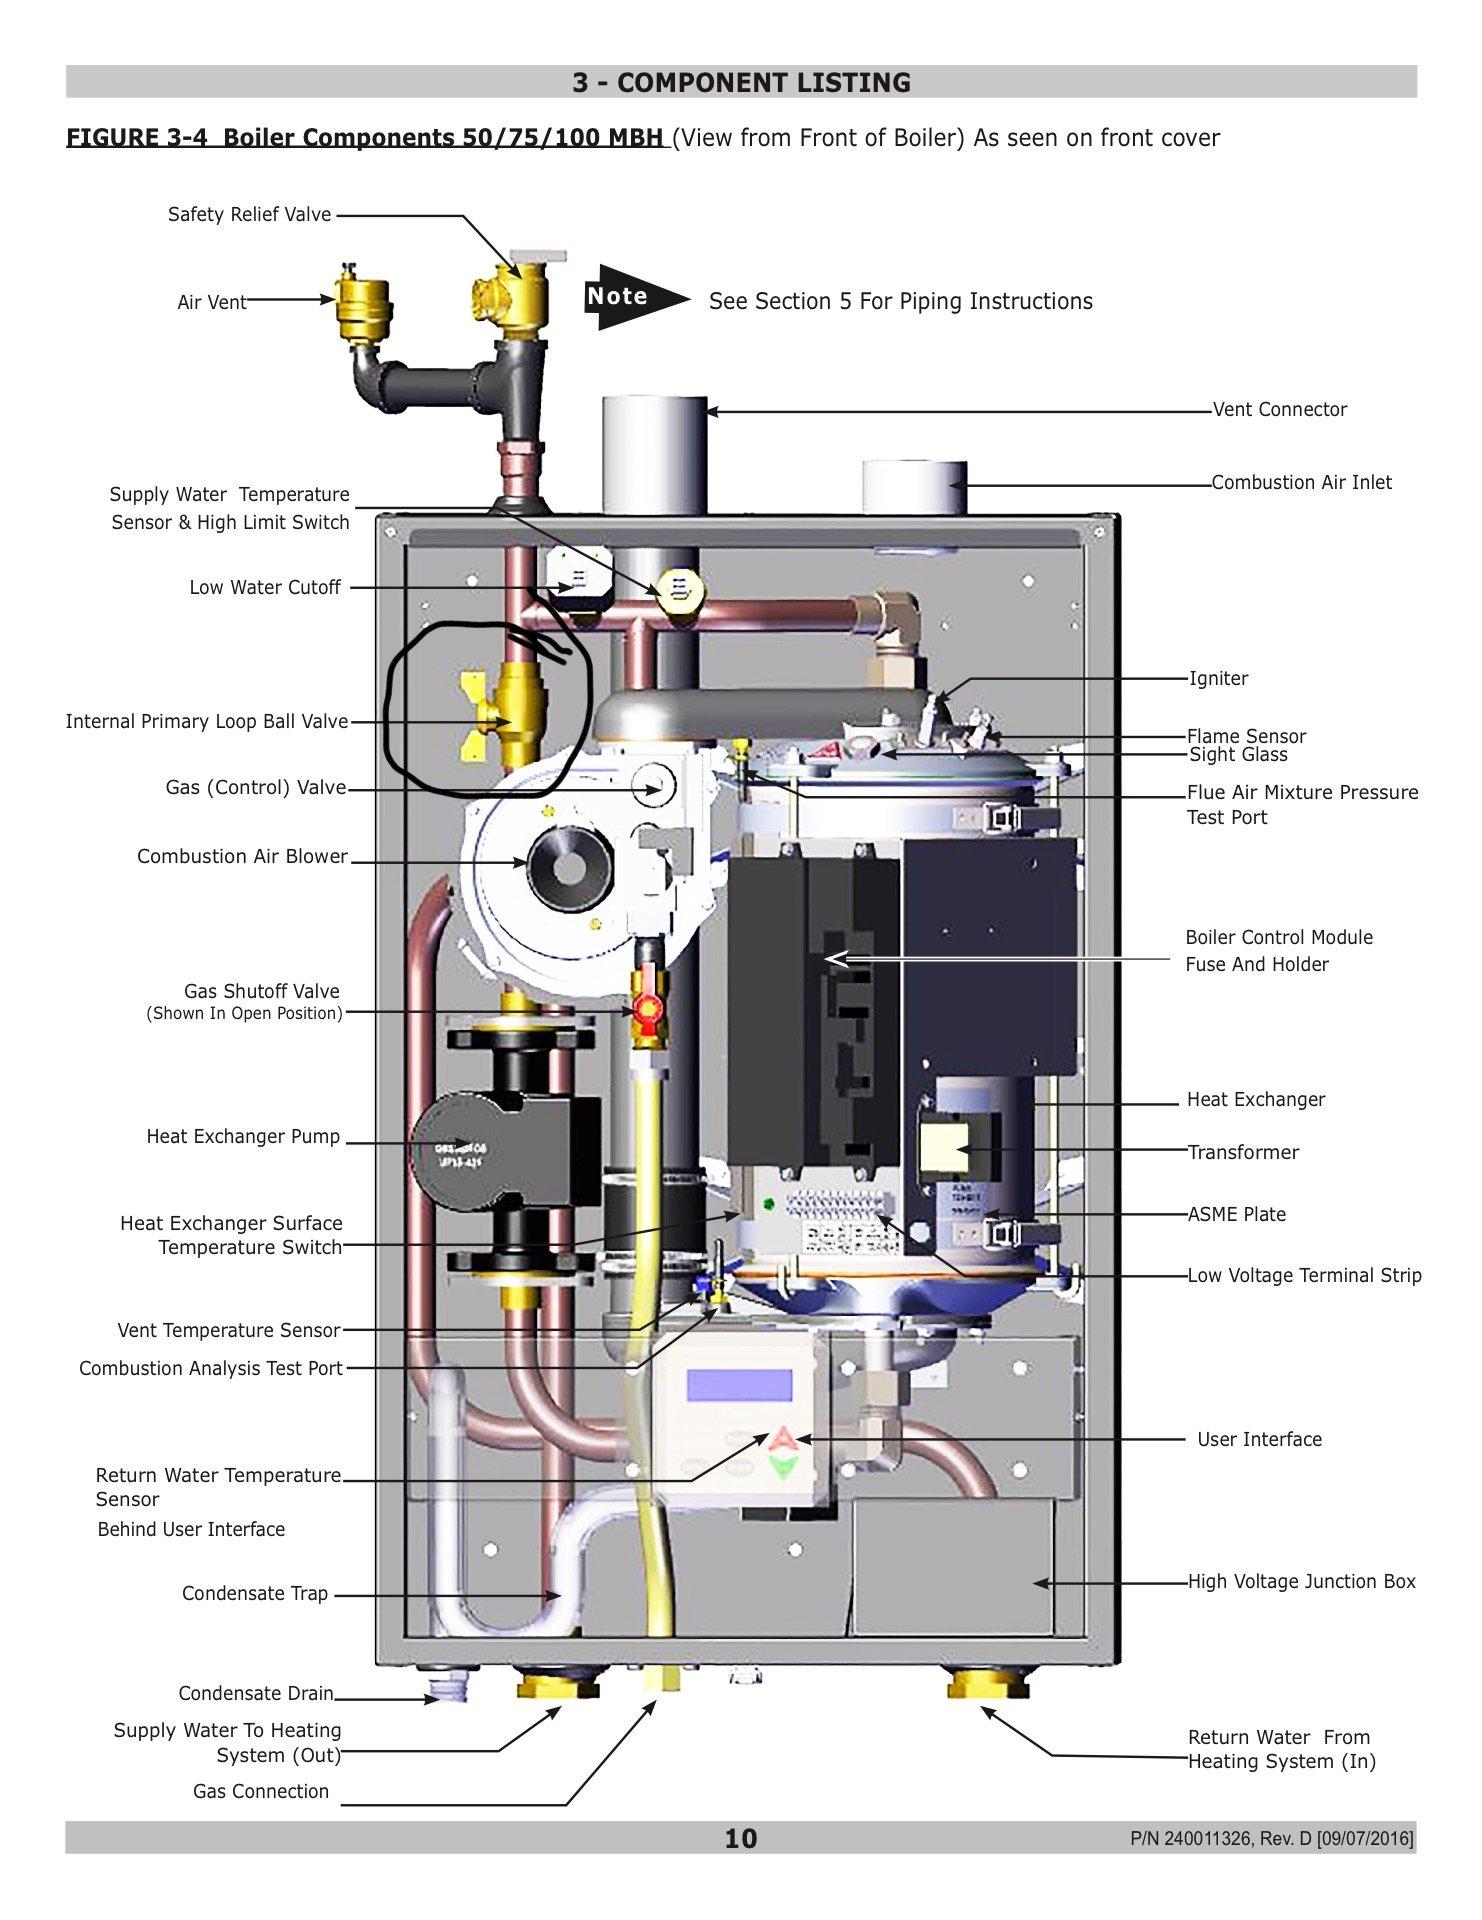 Dunkirk Boiler Wiring Diagram   Wiring Diagram on fireplace wiring diagram, tekmar wiring diagram, central heating wiring diagram, bell and gossett wiring diagram,